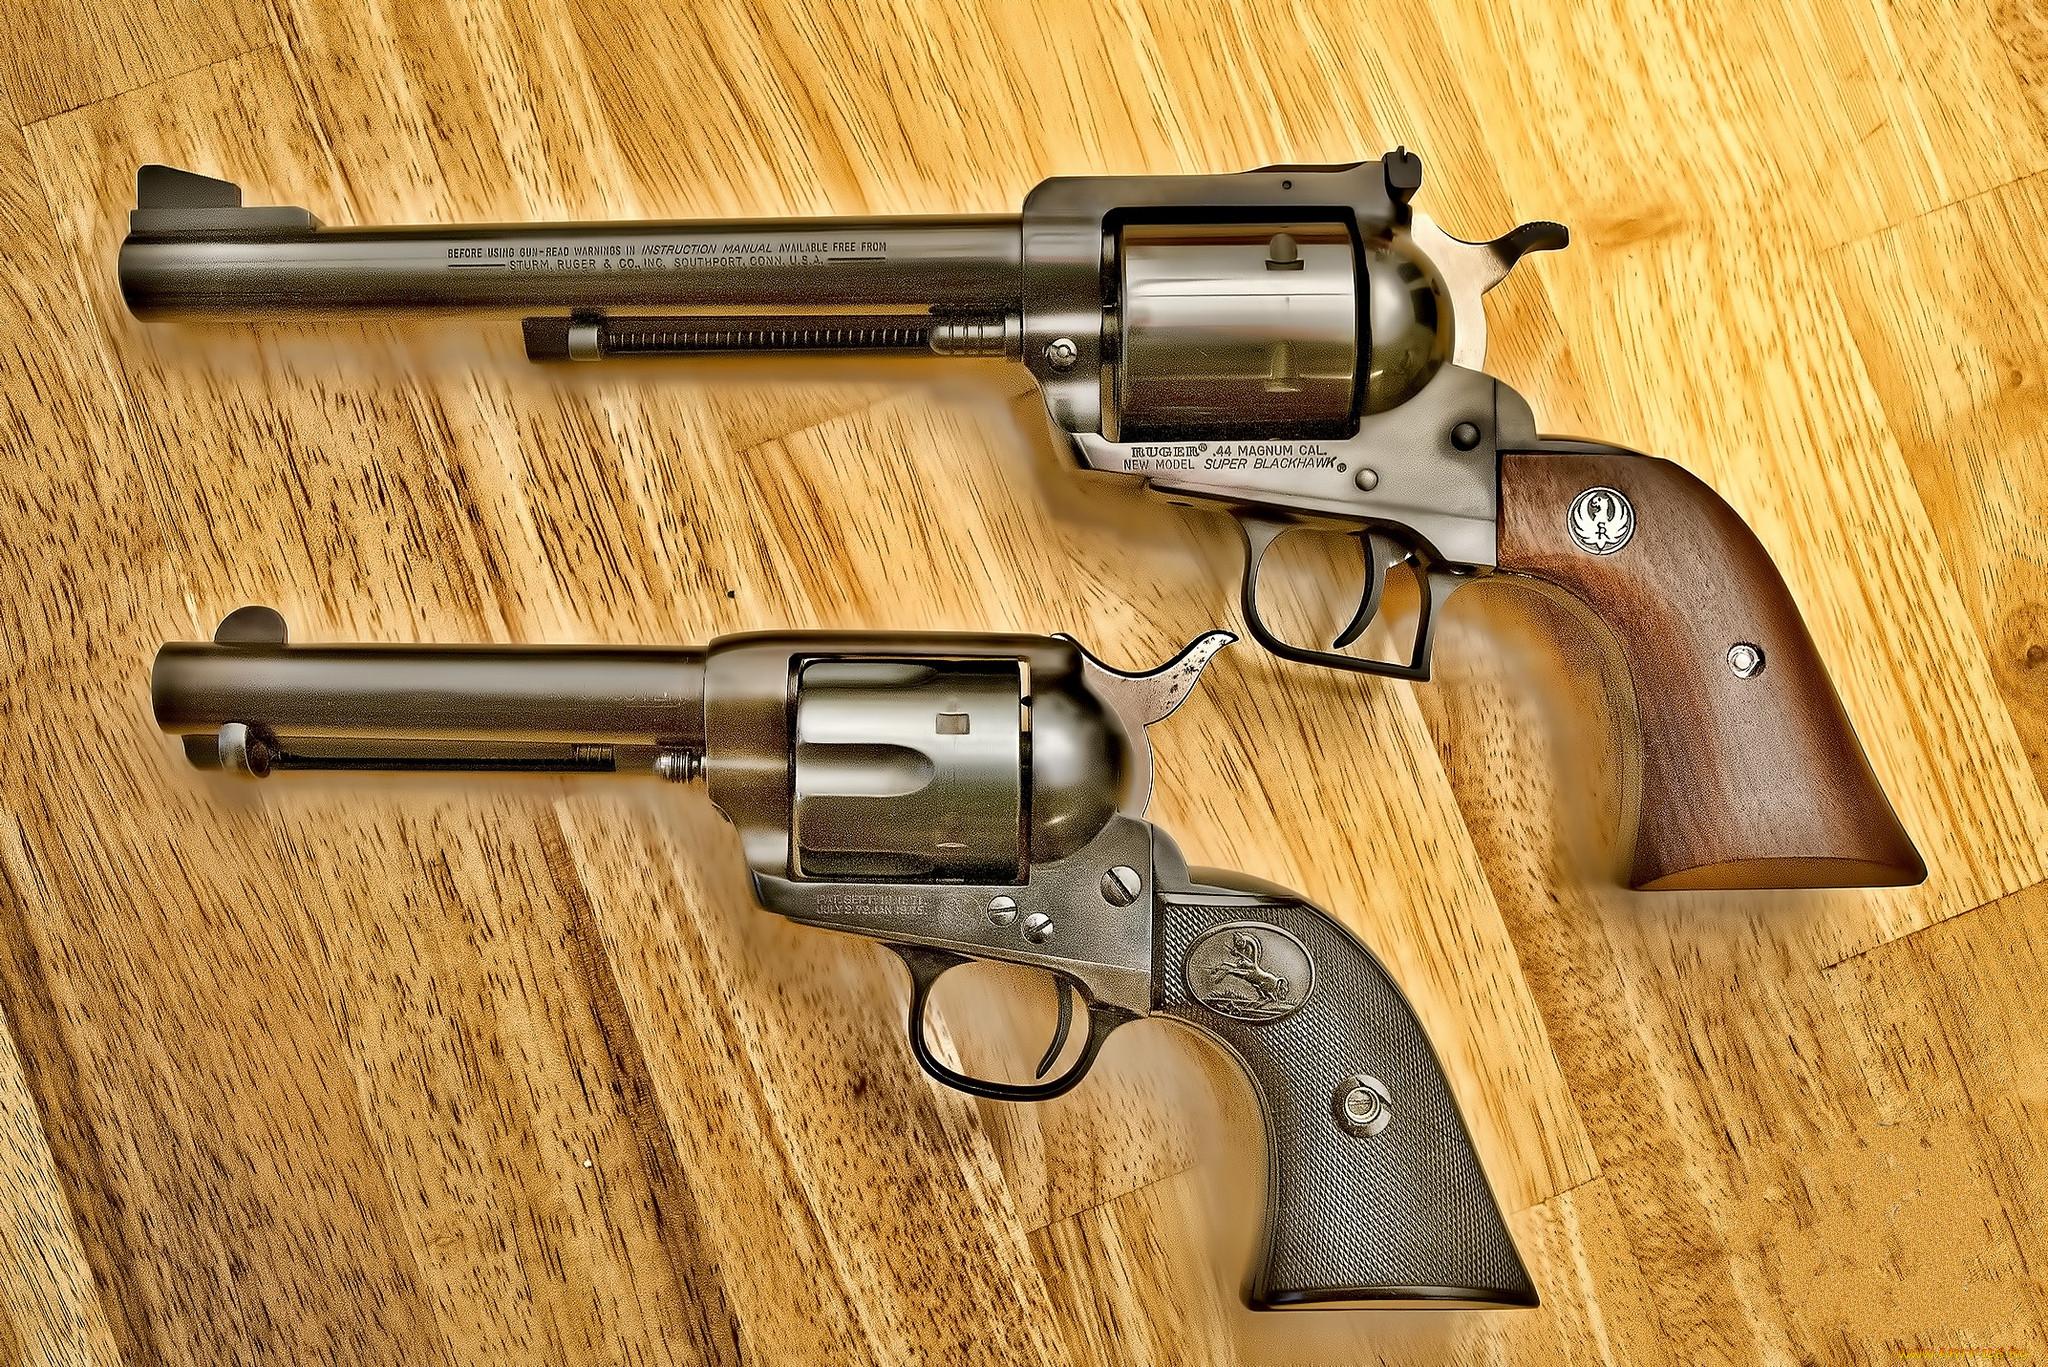 ruger blackhawk , 44 magnum from 1985 and colt frontier series i , 44-40 from 1892, оружие, револьверы, история, раритеты